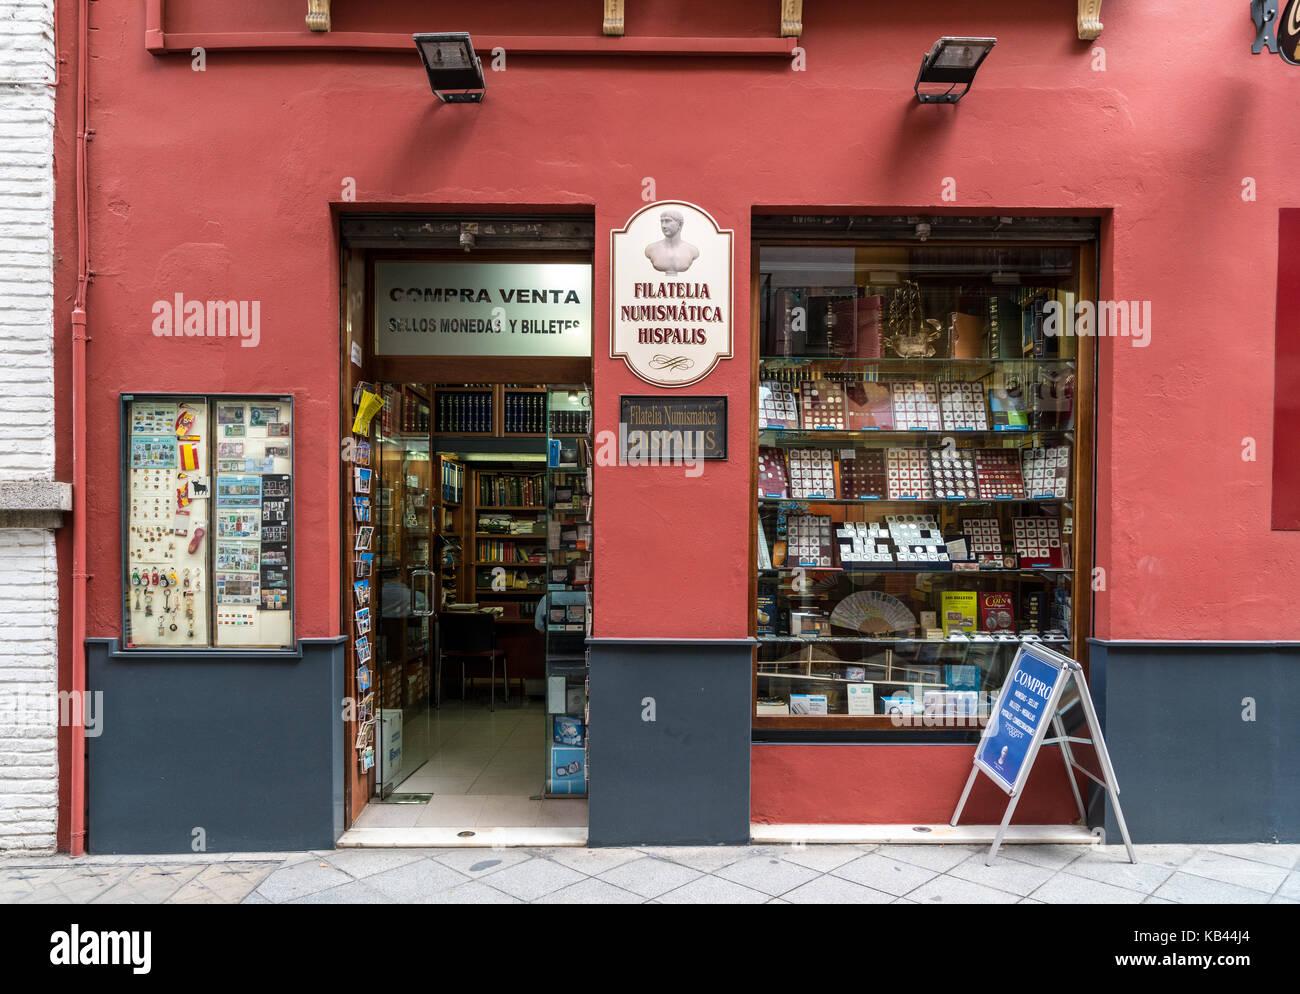 Philatelic and numismatic shop in Barrio de Santa Cruz of Seville, Spain - Stock Image